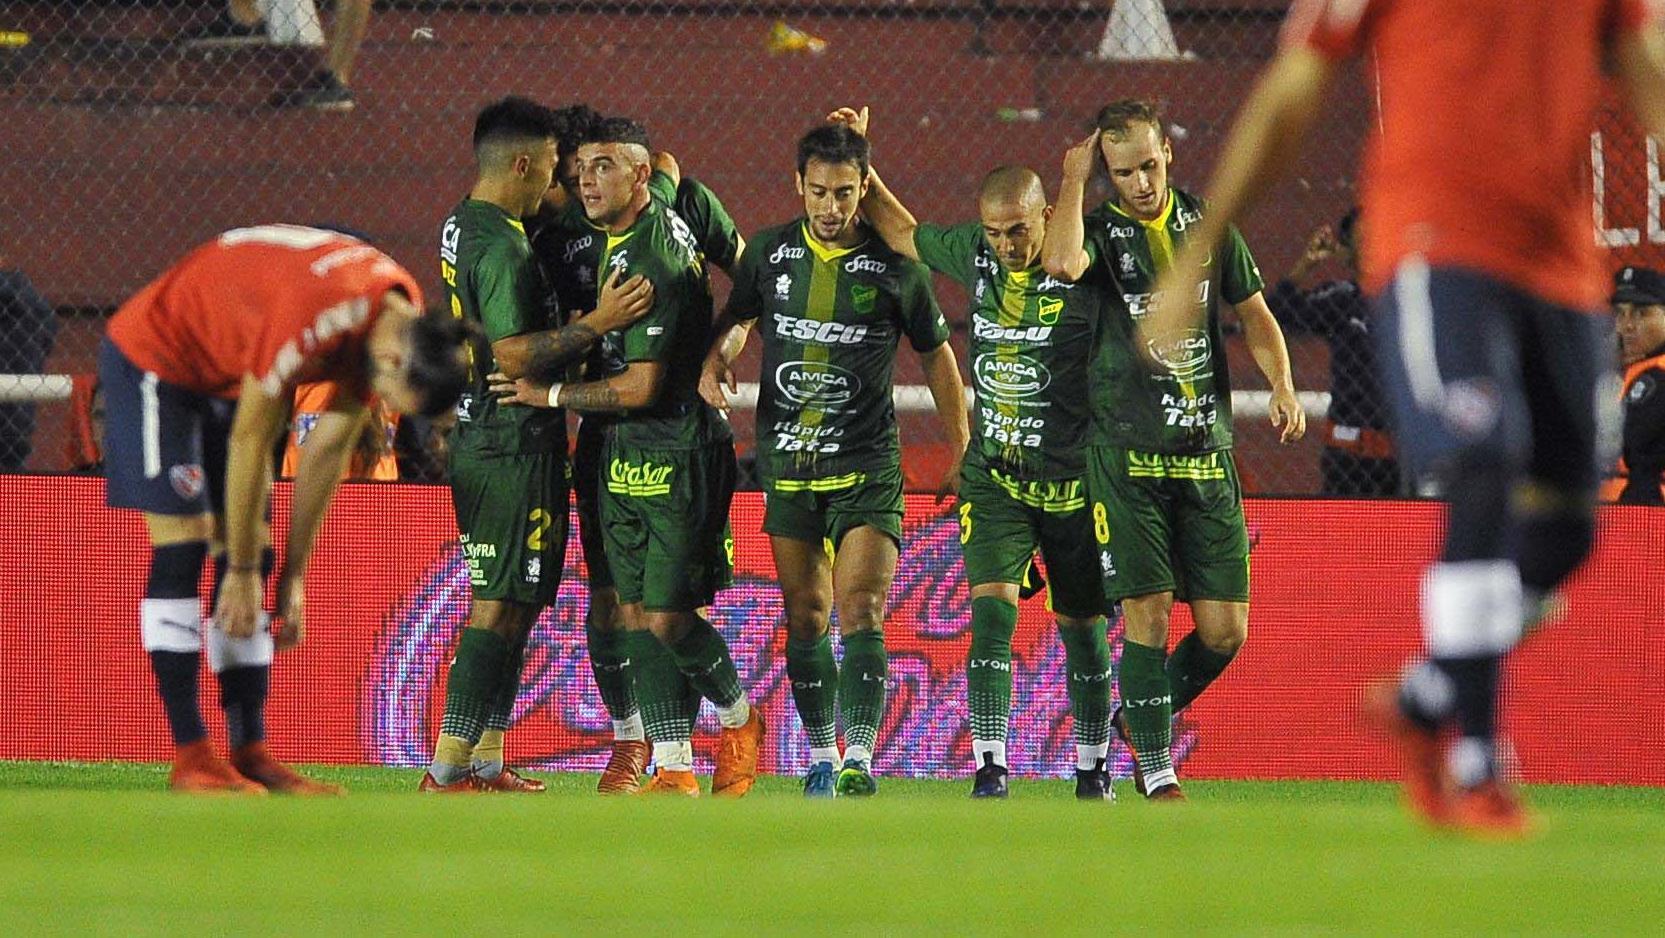 Bareiro anotó el único tanto del partido. (Foto: Télam)